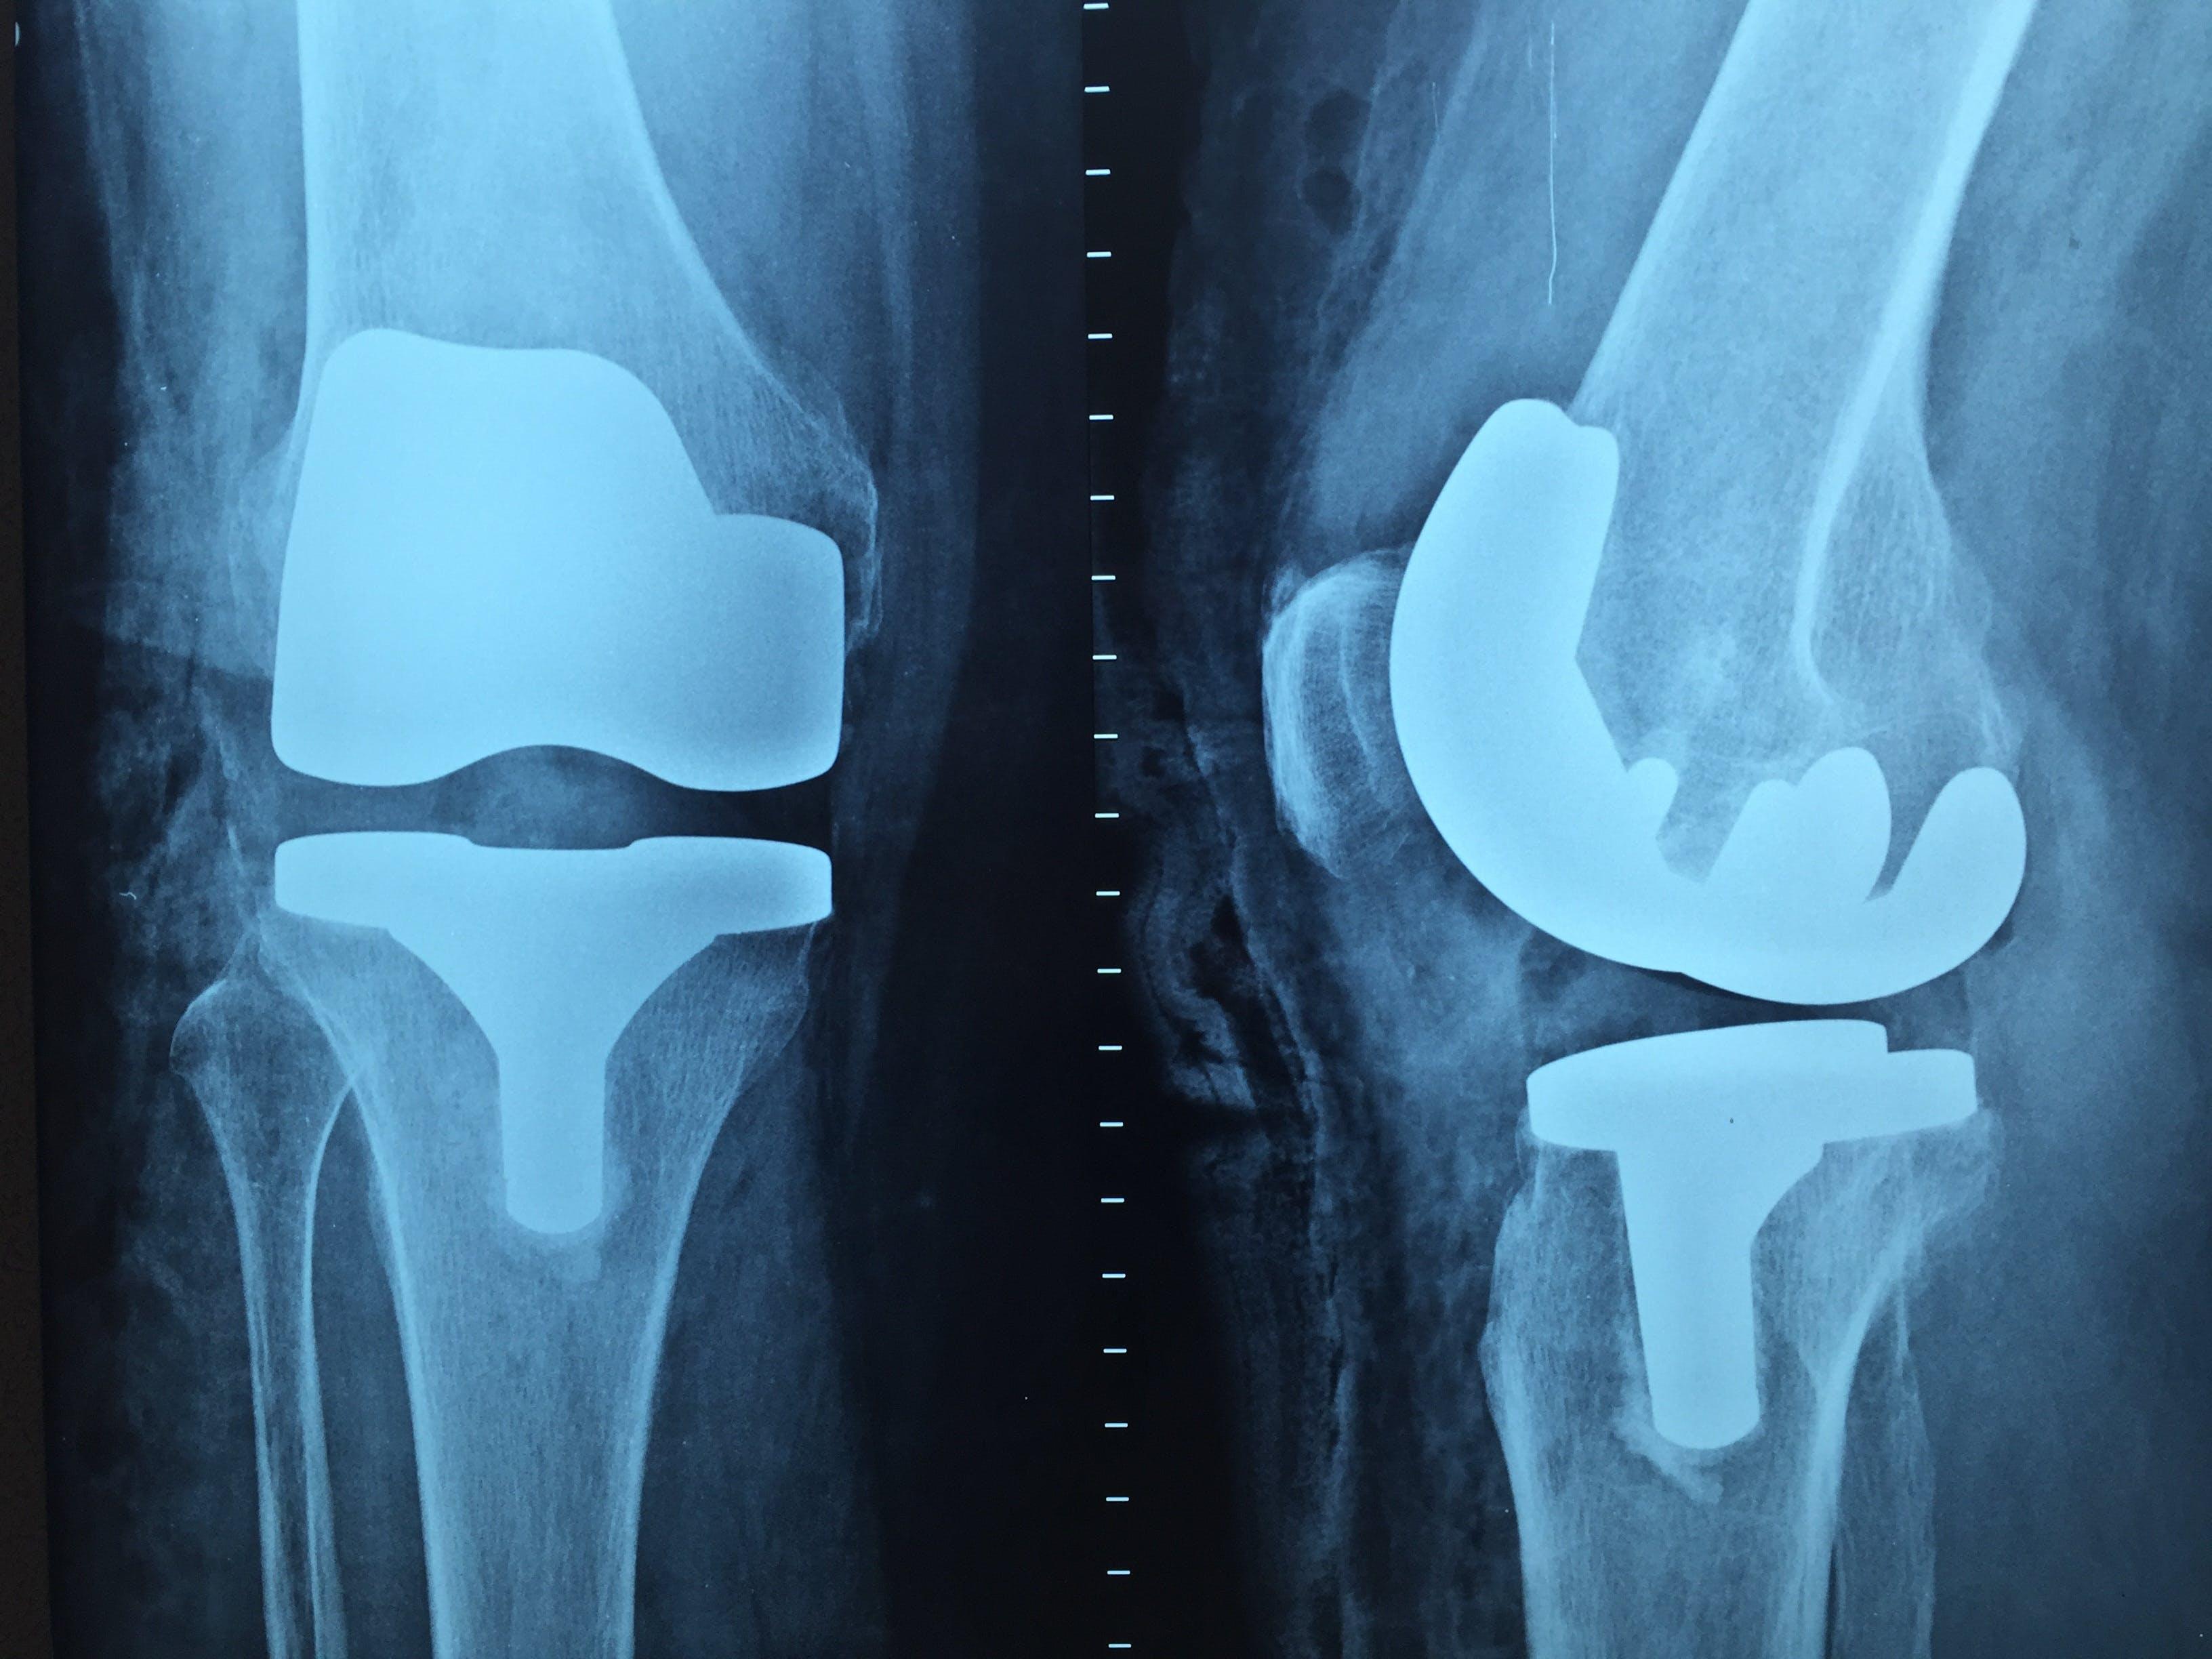 Free stock photo of doctor, knee, x-ray, orthopedics